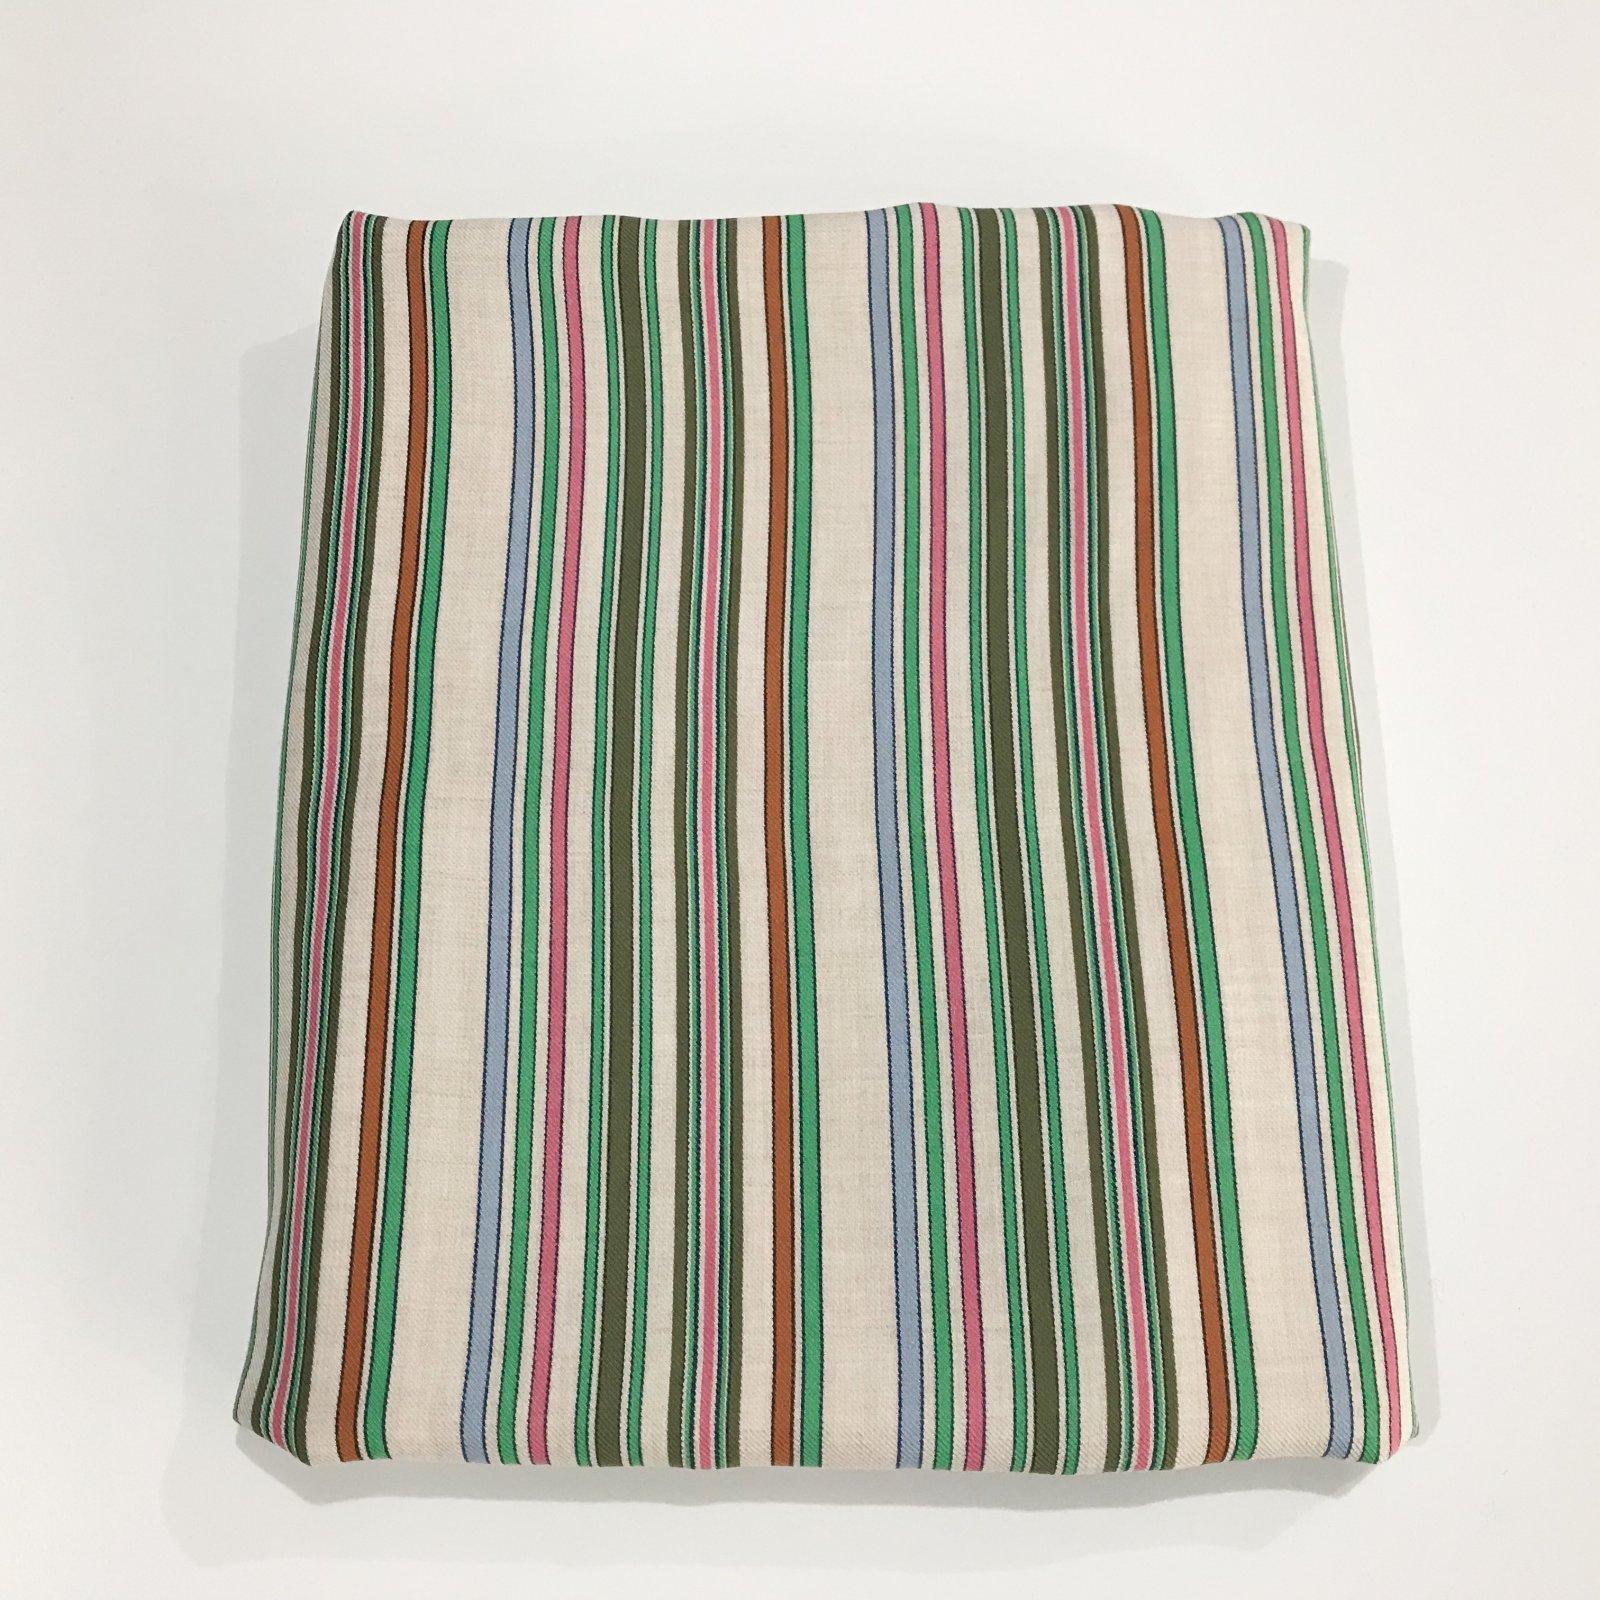 2 1/2 yards - Viscose Stripes - Jade & Pink